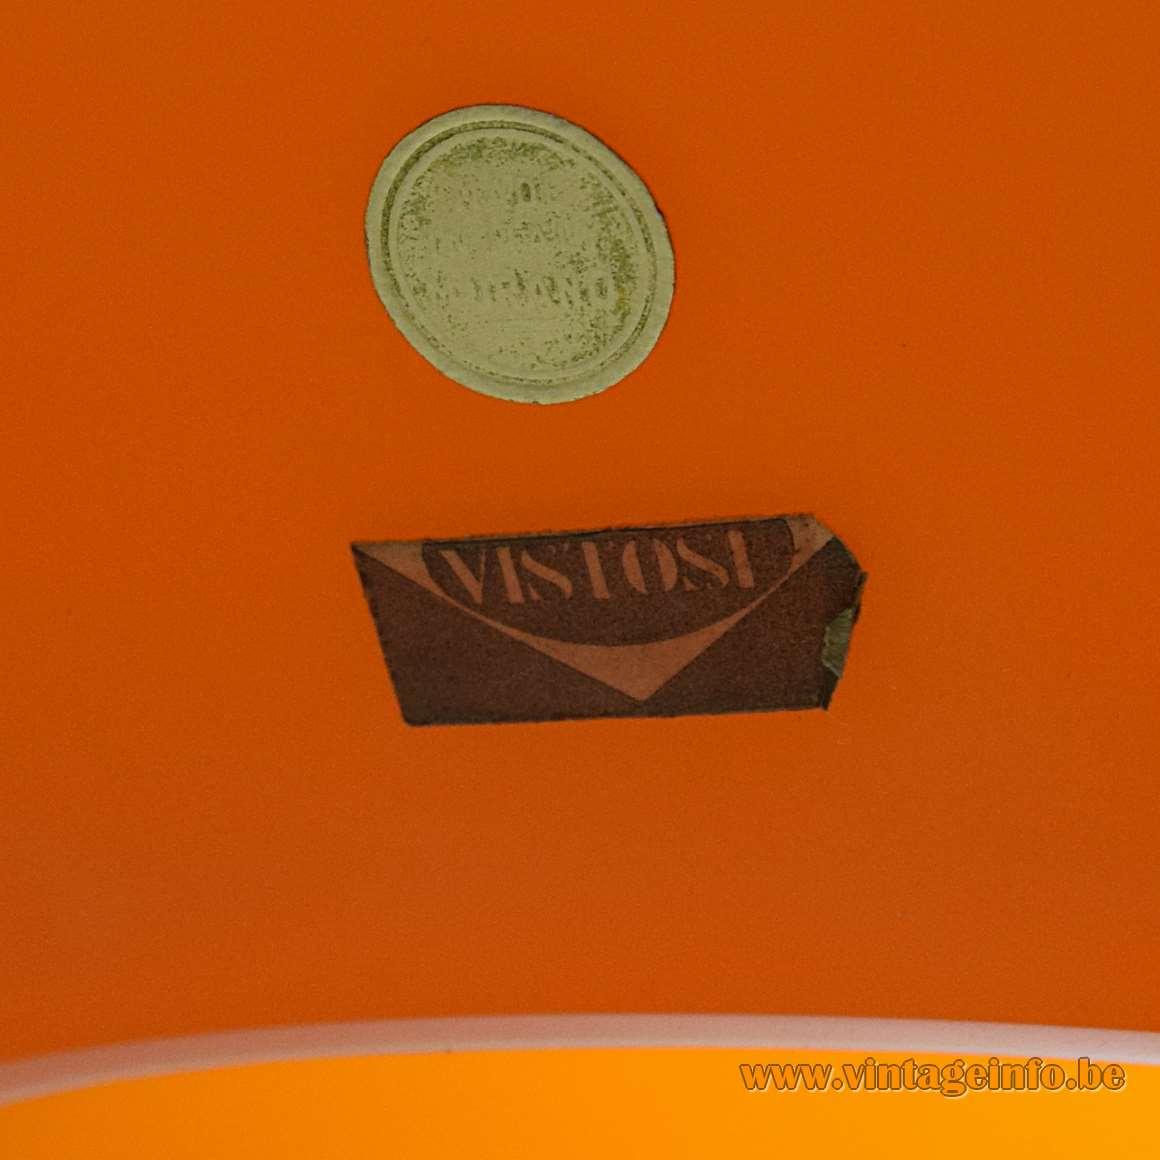 Vistosi orange Onion pendant lamp round Murano label rectangular Vistosi label 1950s 1960s Italy